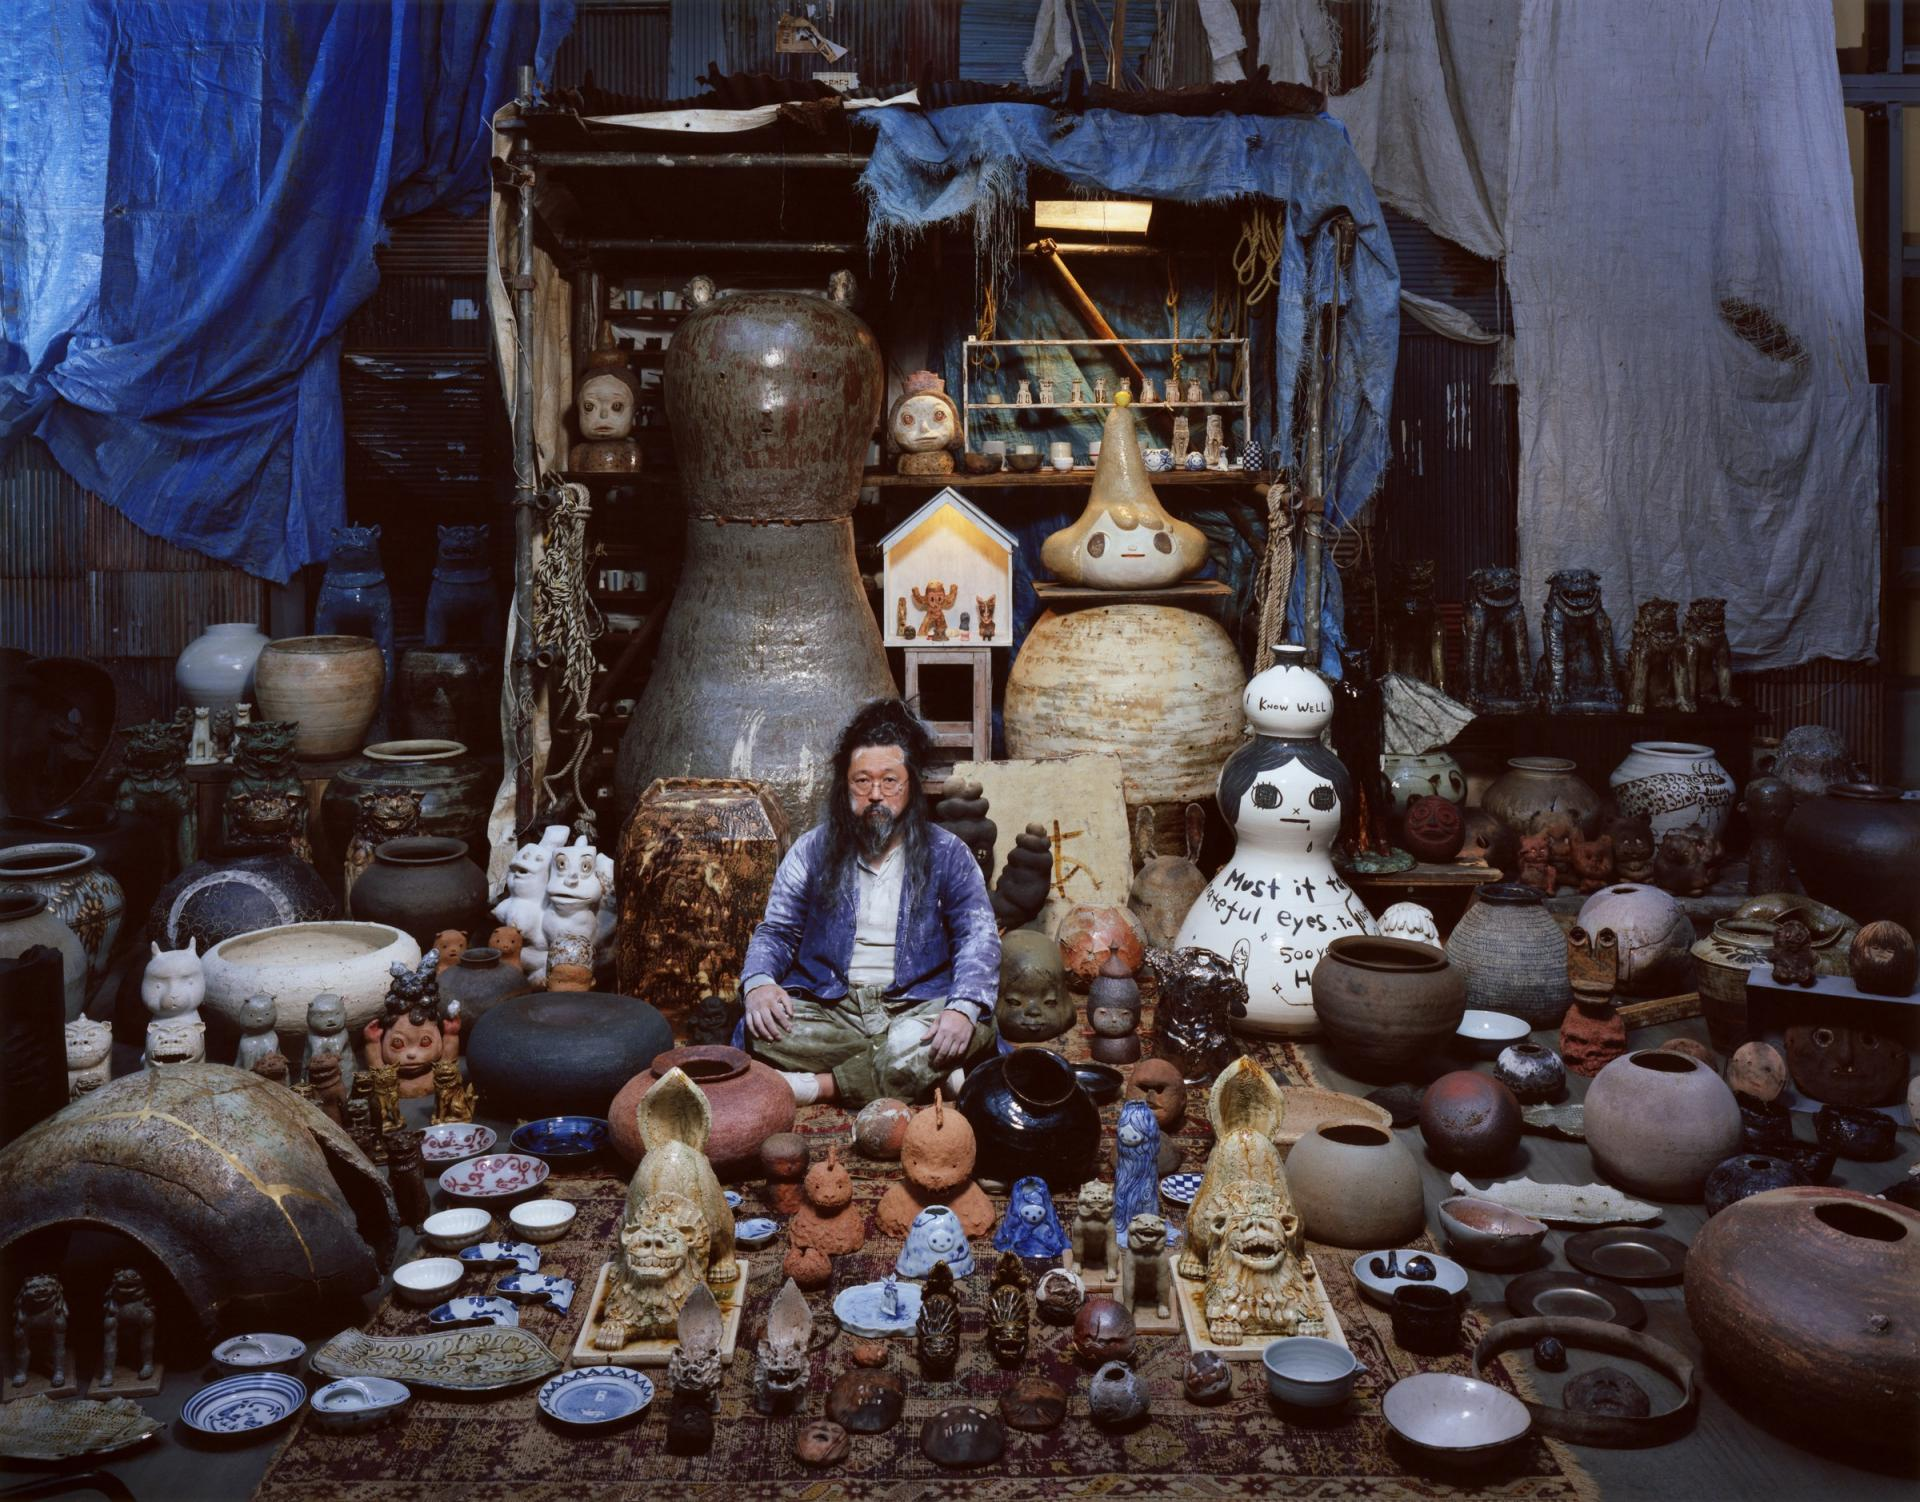 Japanese artist Takashi Murakami, curator, Perrotin Matignon